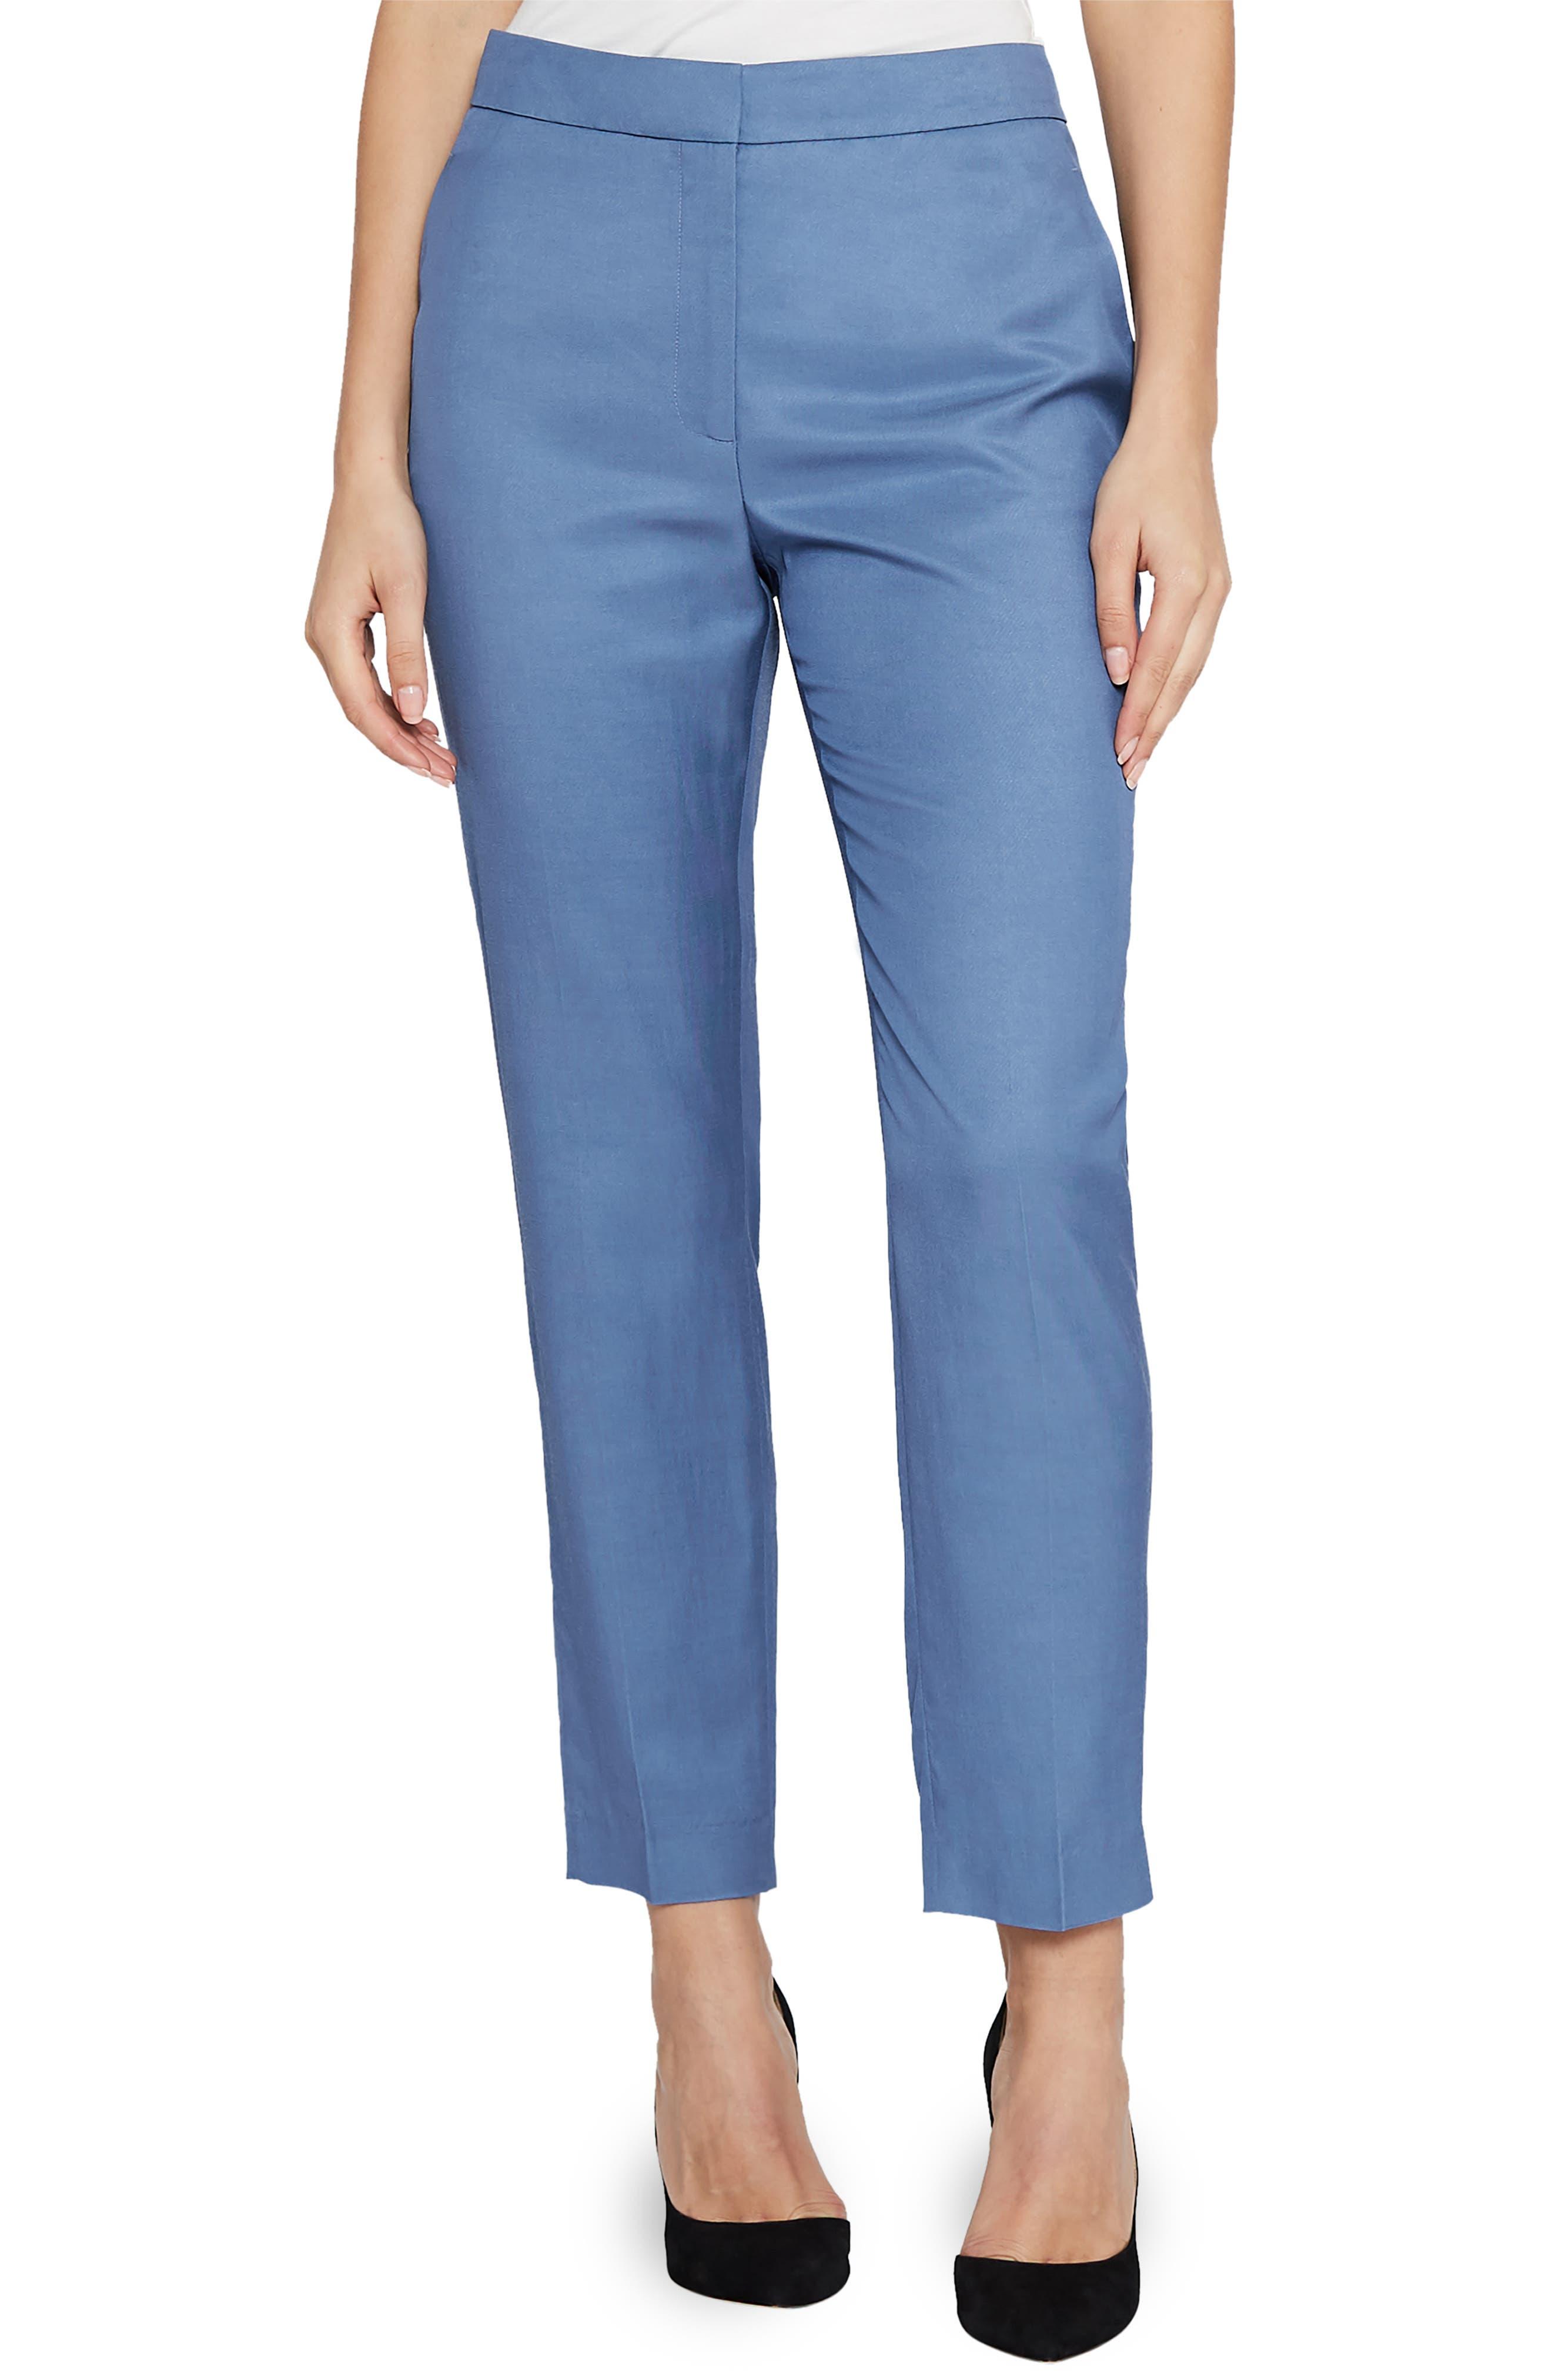 Etta Wool Blend Trousers,                         Main,                         color, 410